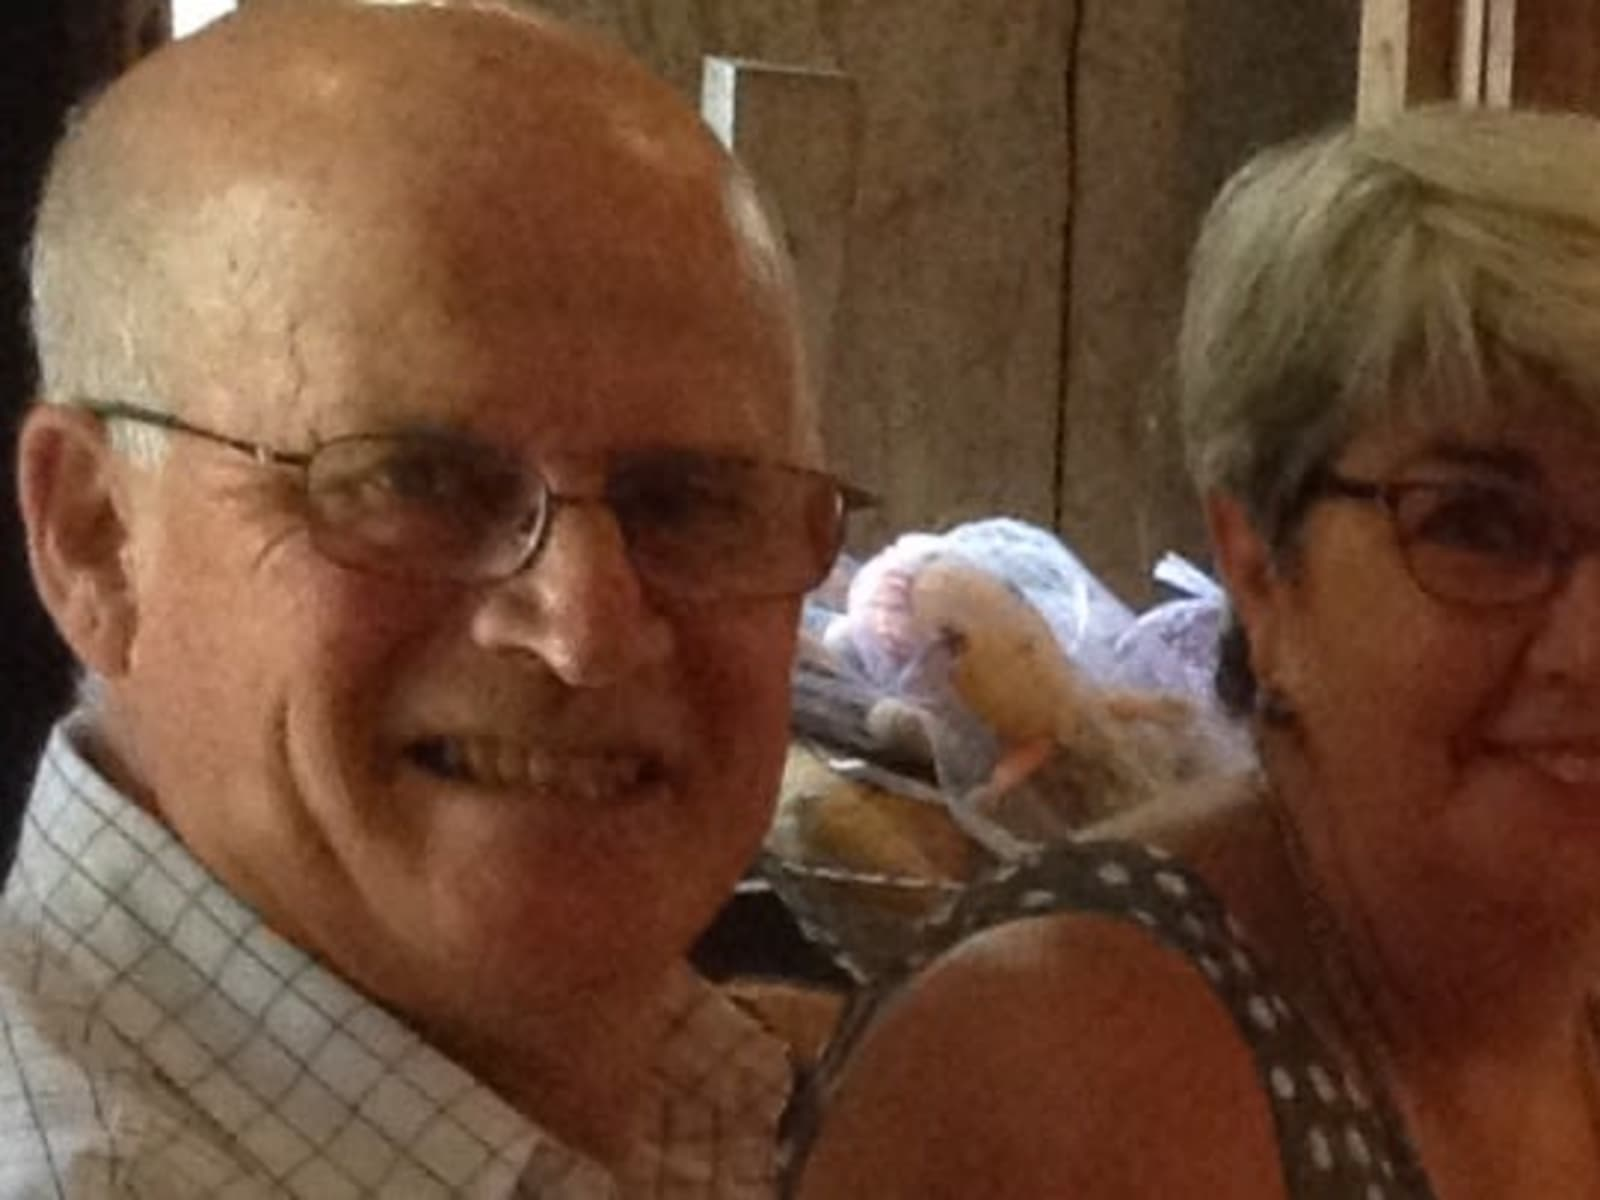 Robyn & tom & Tom from Busselton, Western Australia, Australia